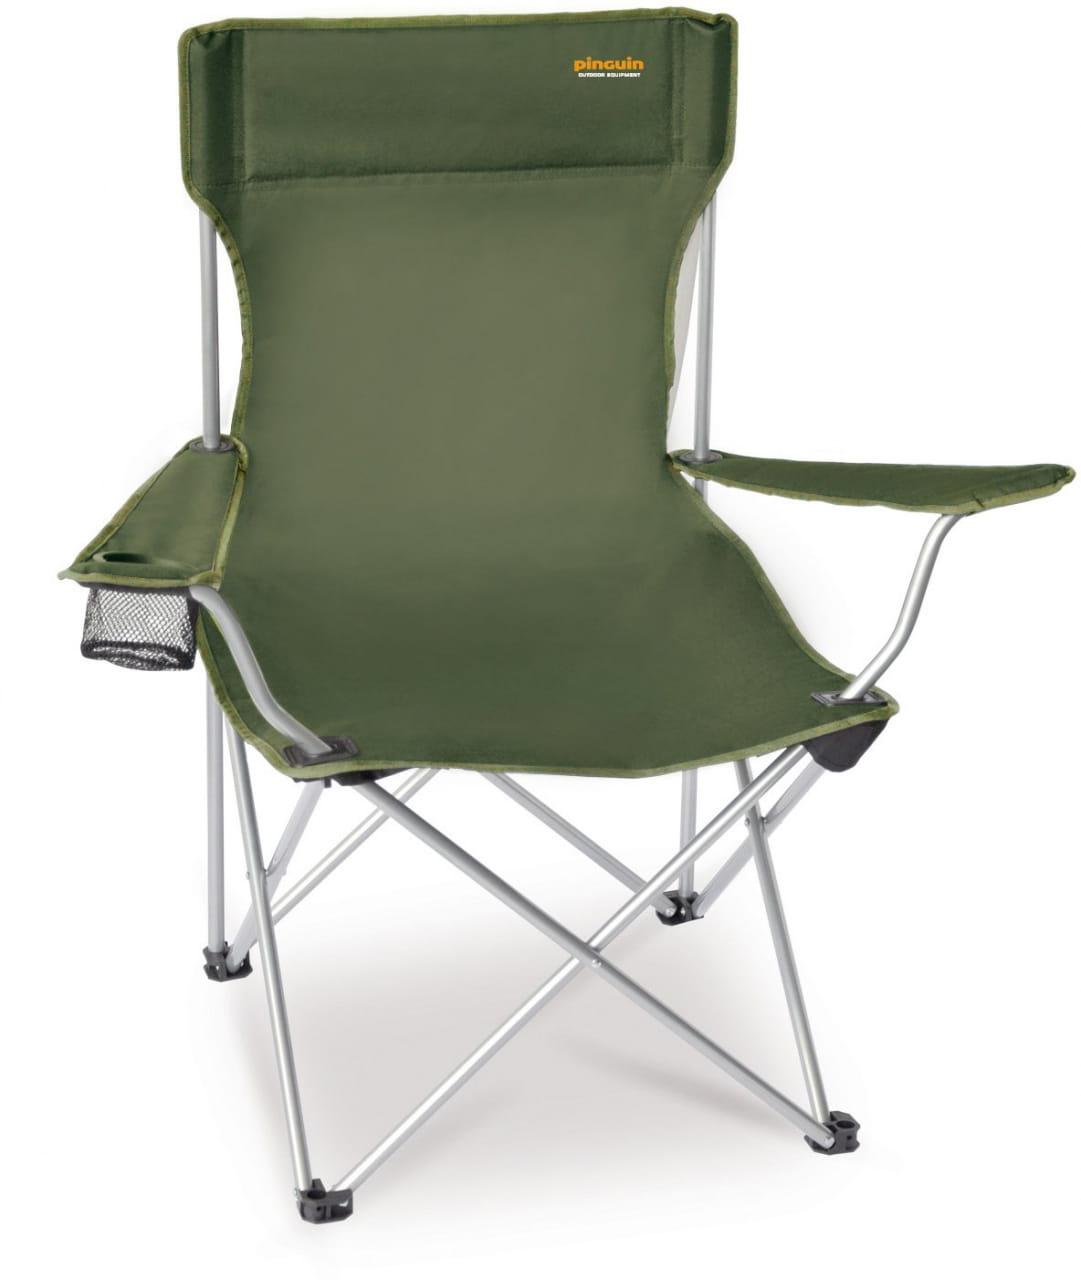 Lehká a skladná campingová židle Pinguin Fisher chair